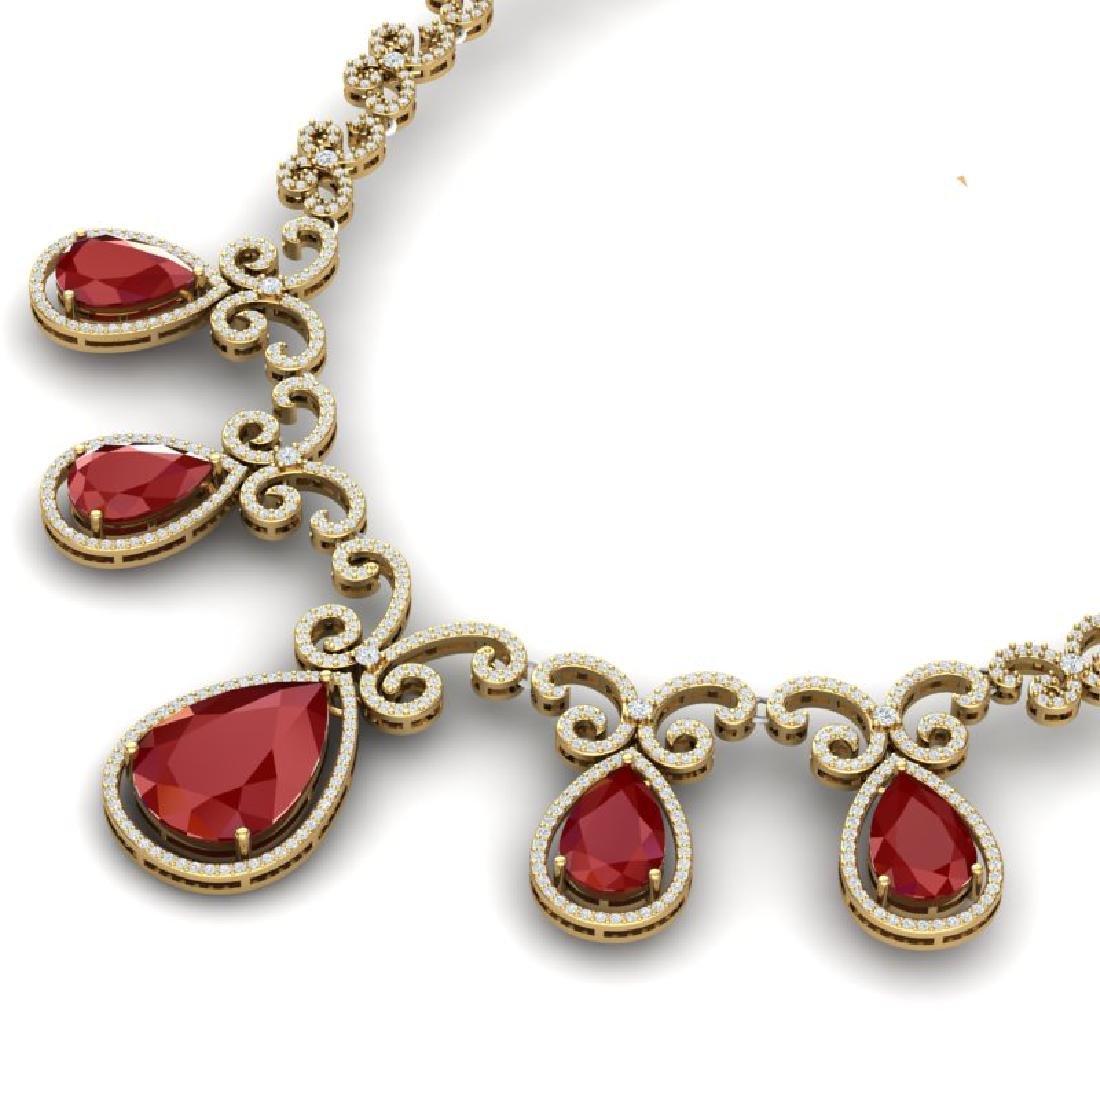 38.42 CTW Royalty Ruby & VS Diamond Necklace 18K Yellow